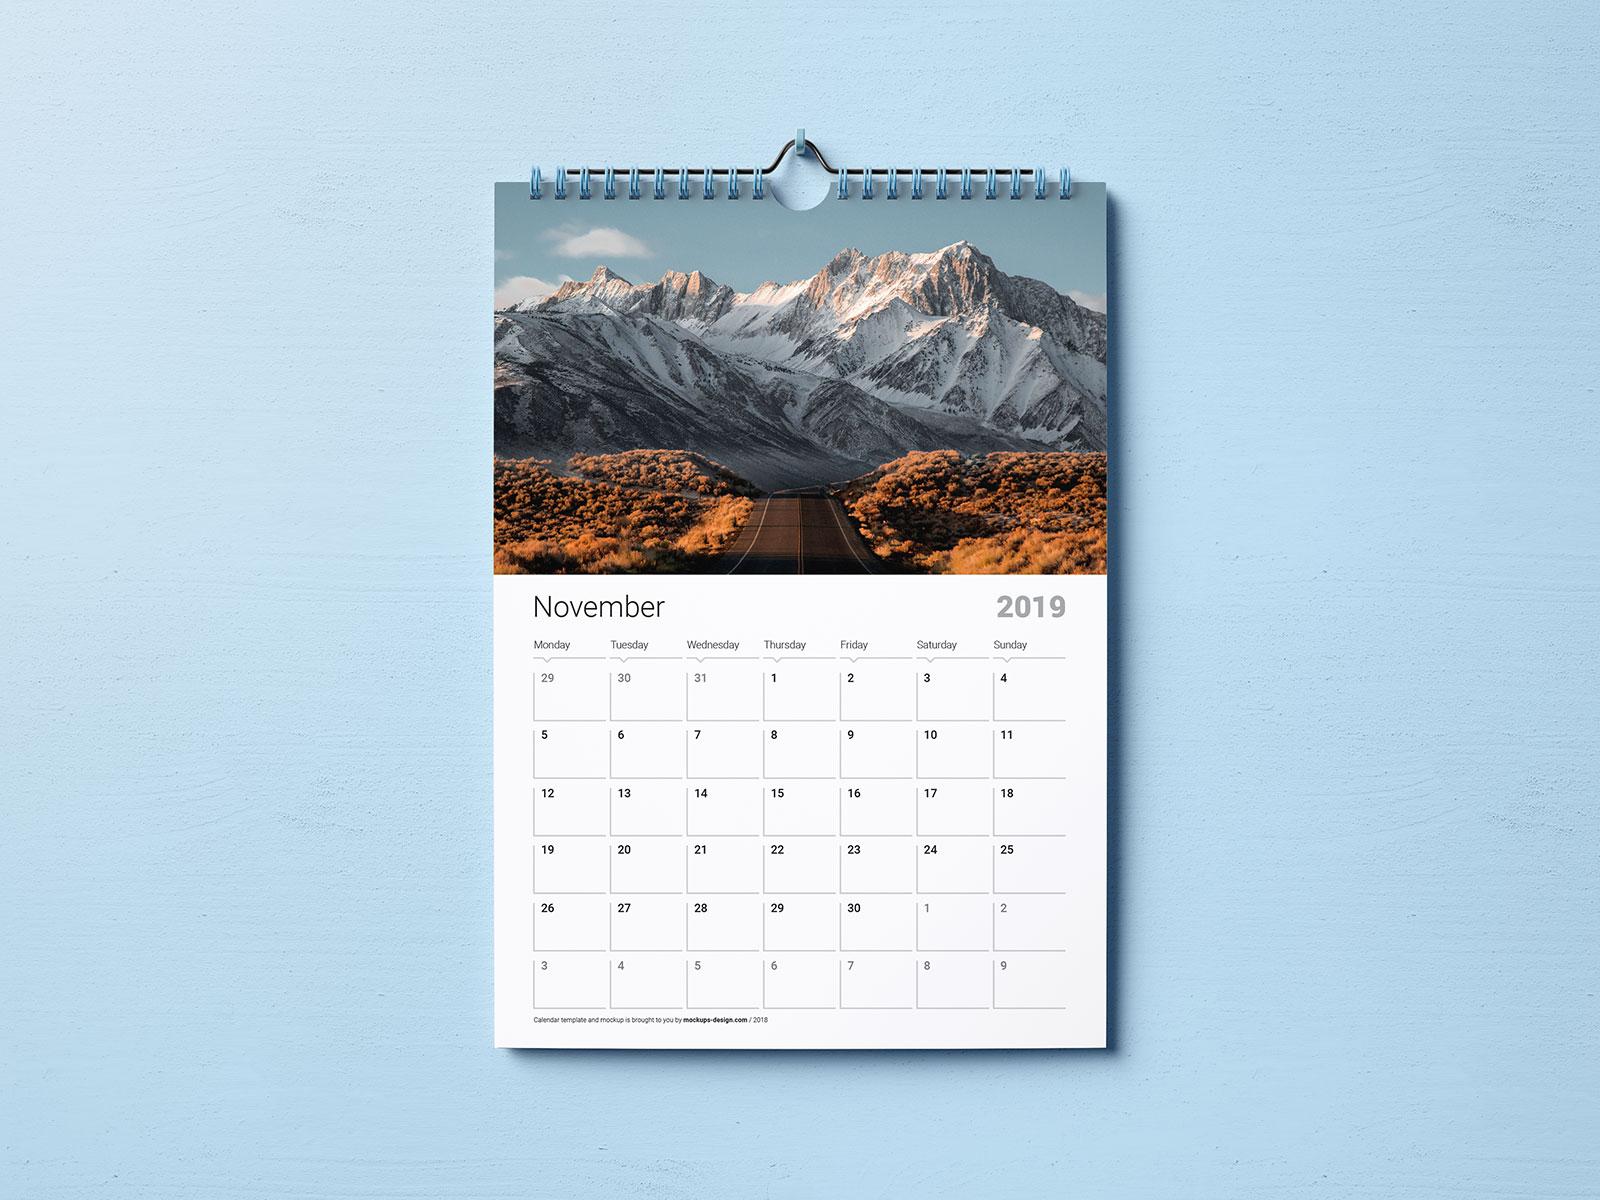 Free-Premium-Wall-Calendar-Mockup-PSD-Set-2019